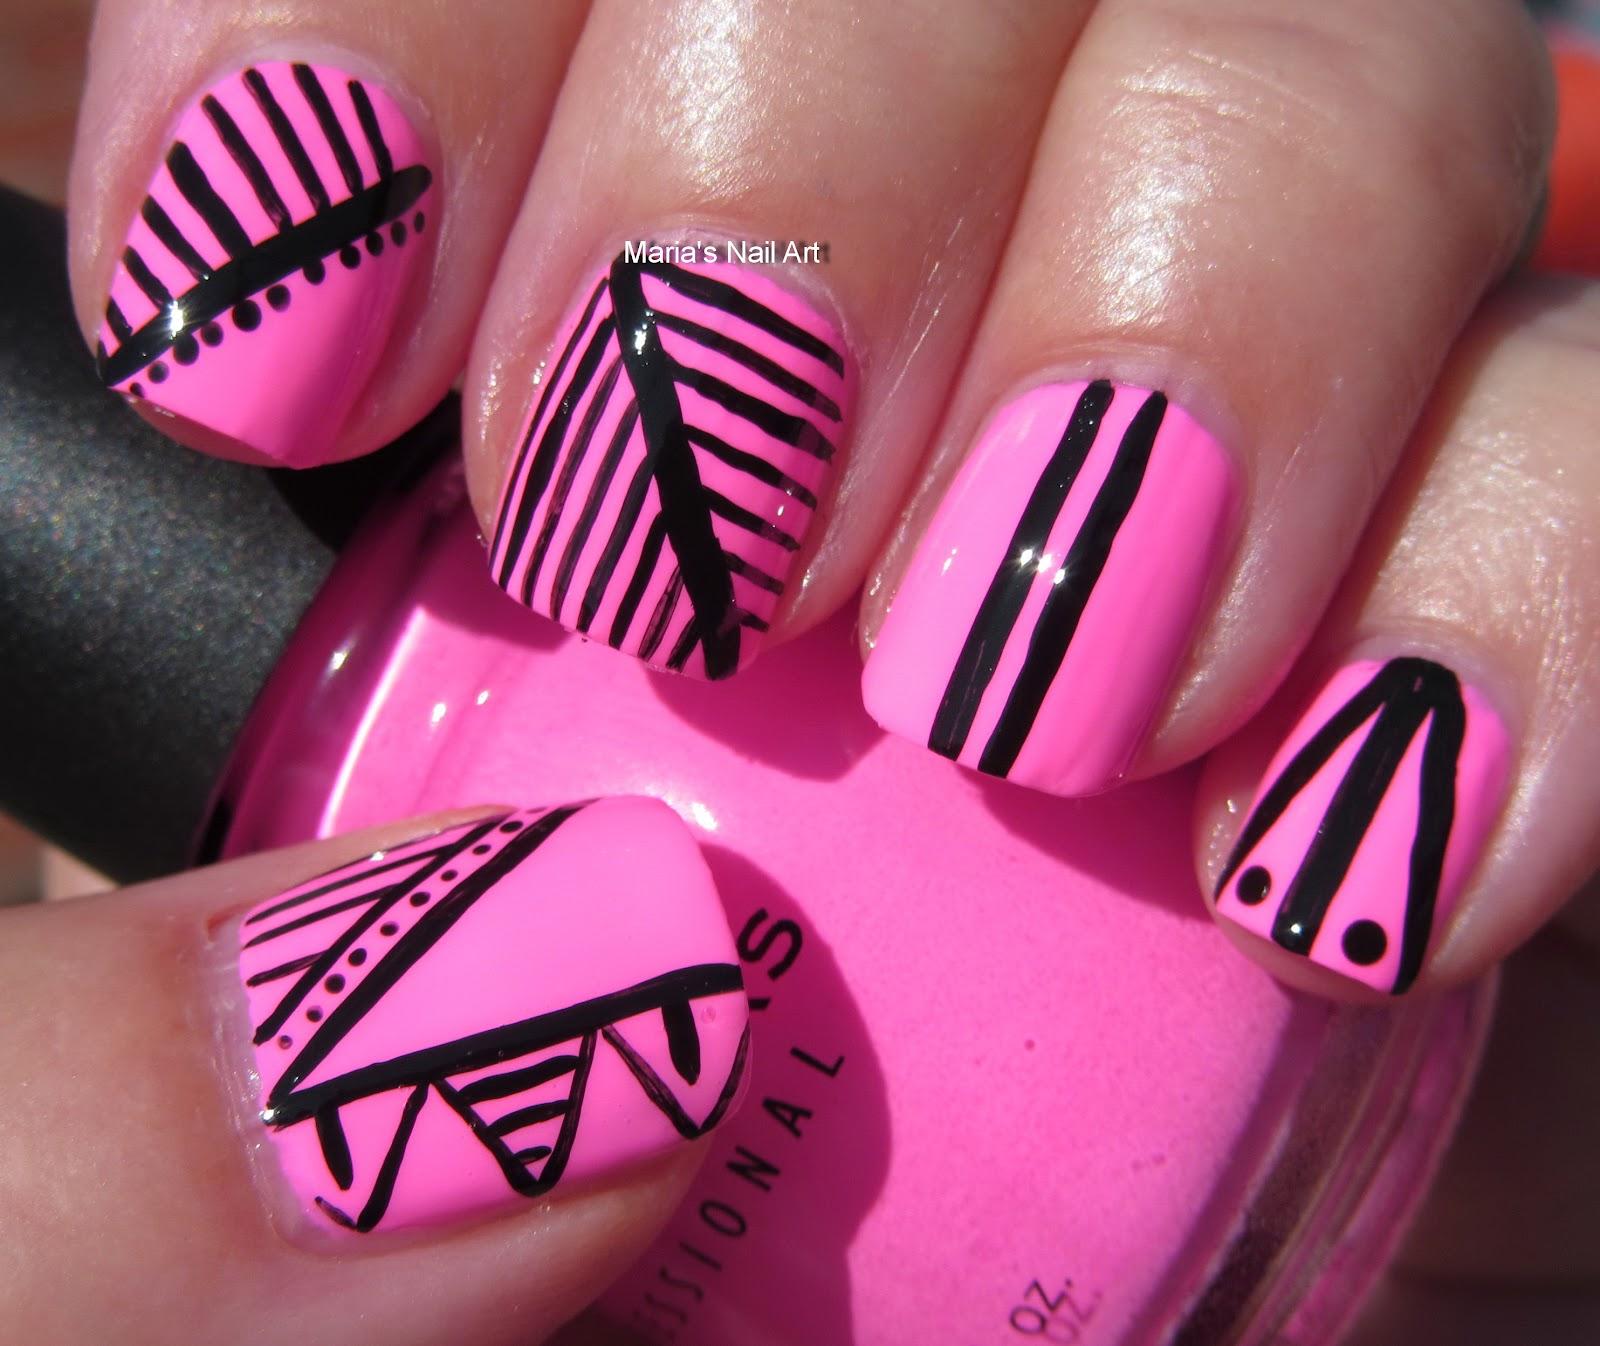 Black White Pink Nail Art Designs: Marias Nail Art And Polish Blog: Black & Pink